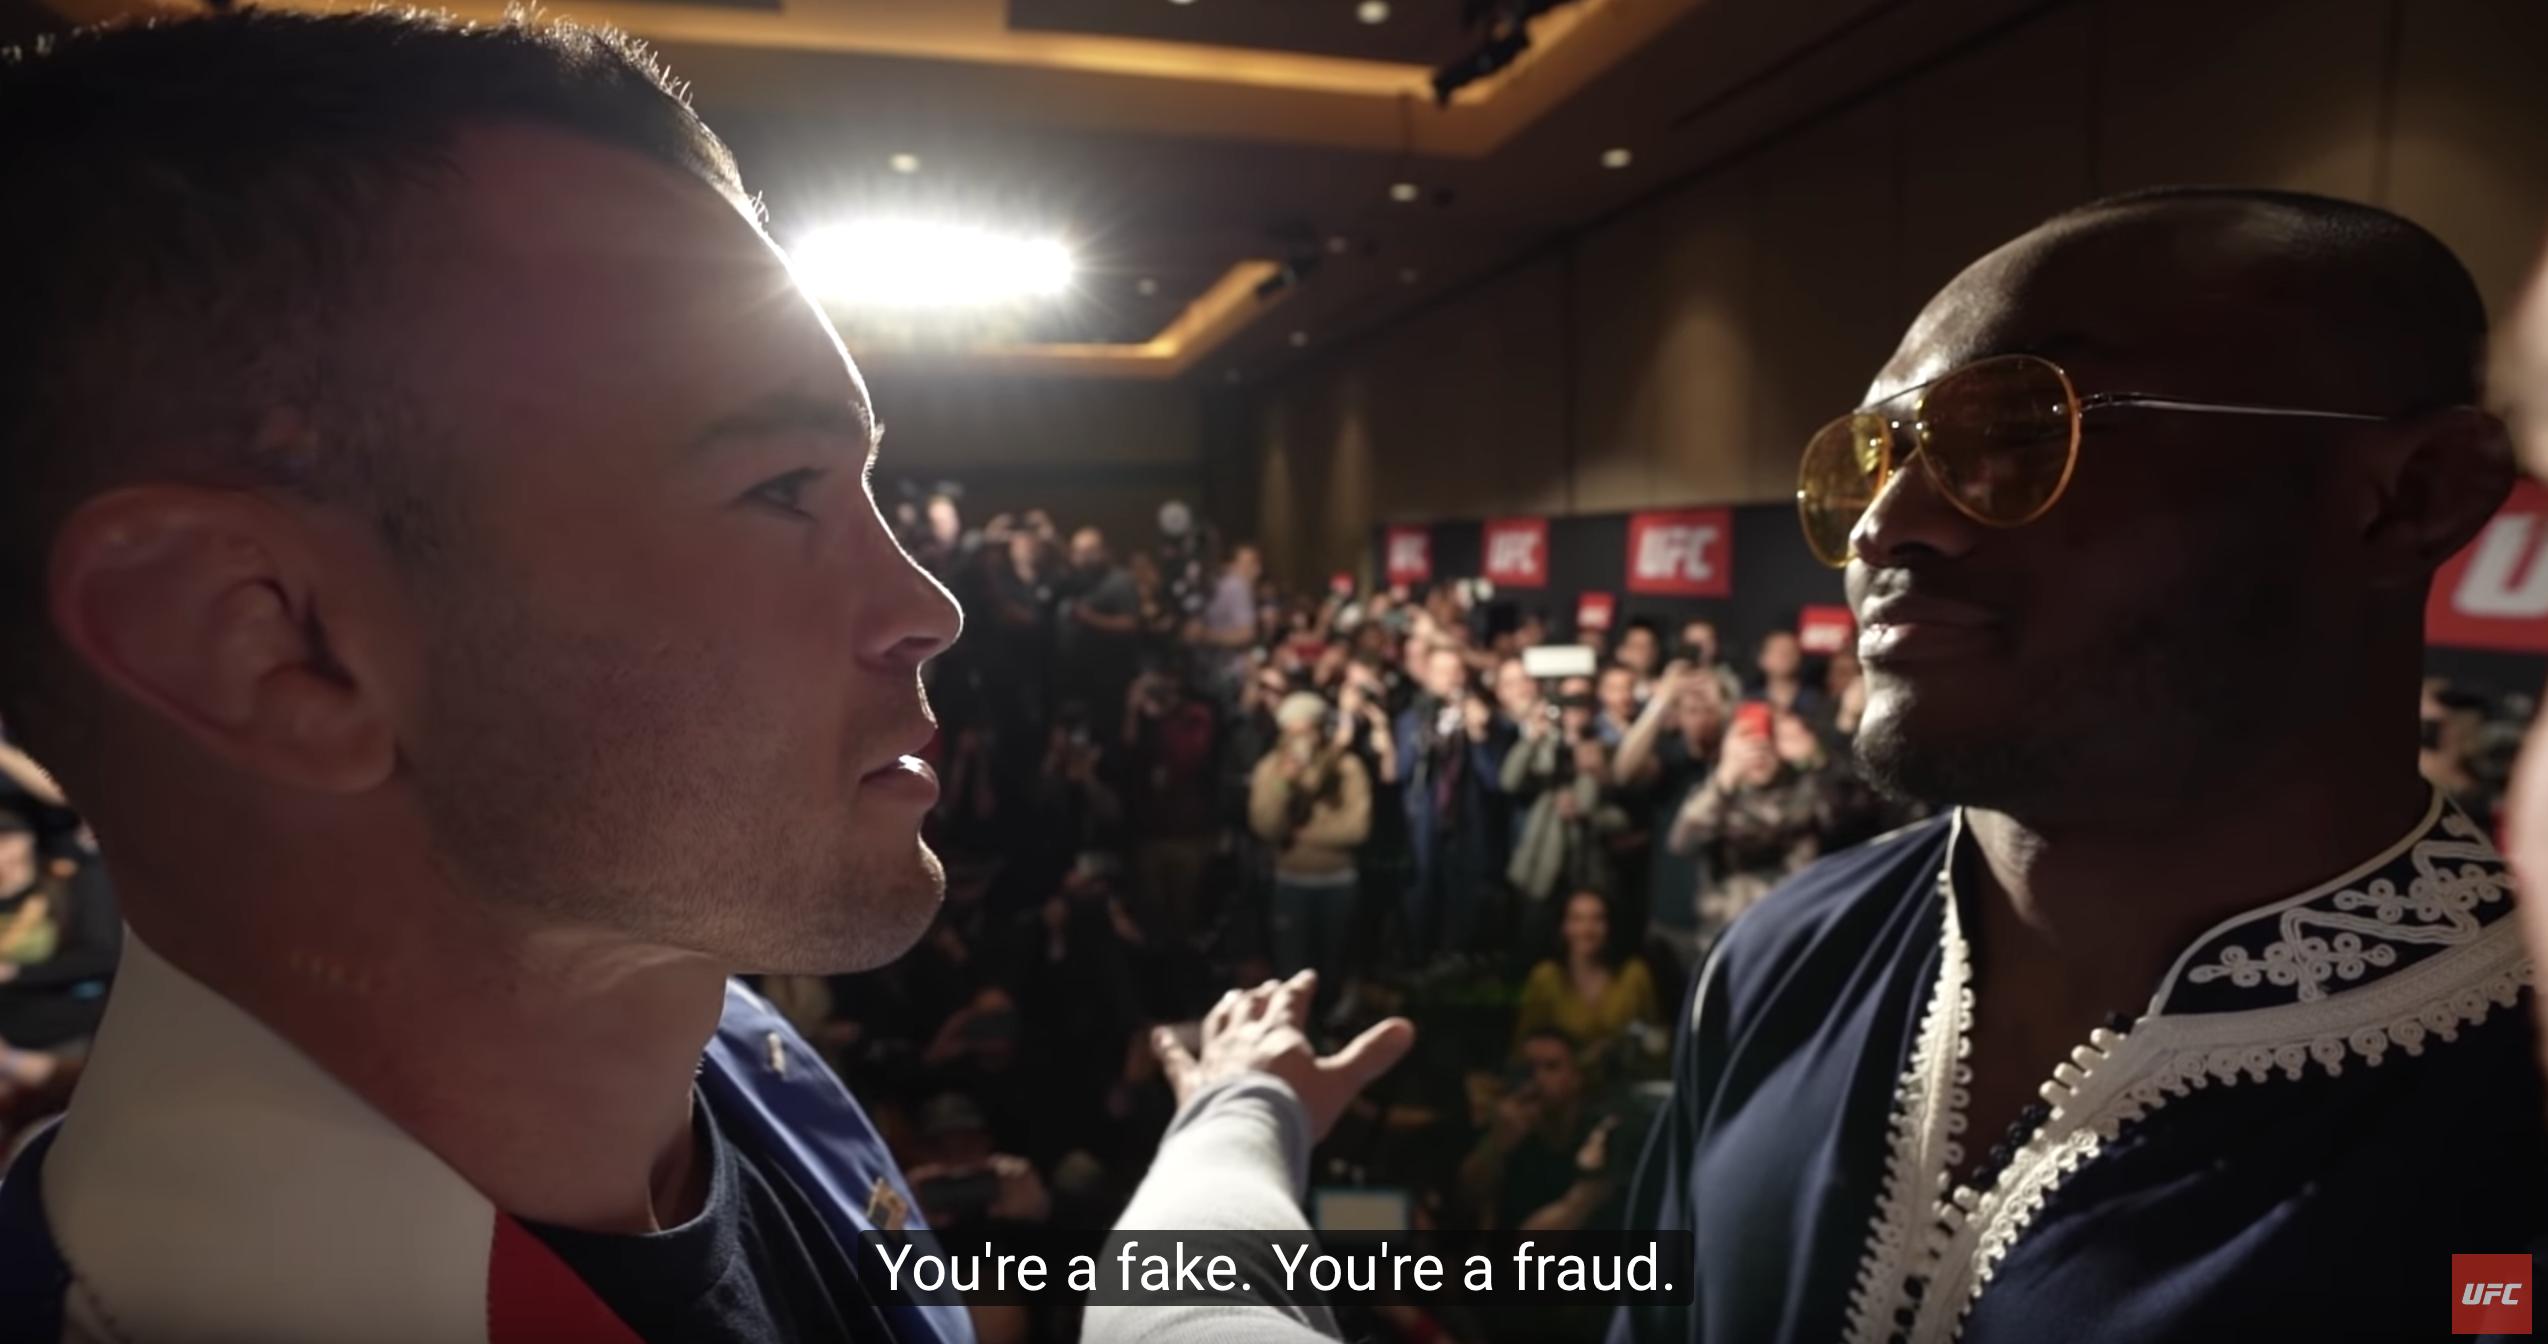 Kamaru Usman Colby Covington UFC 245 Embedded Episode 5